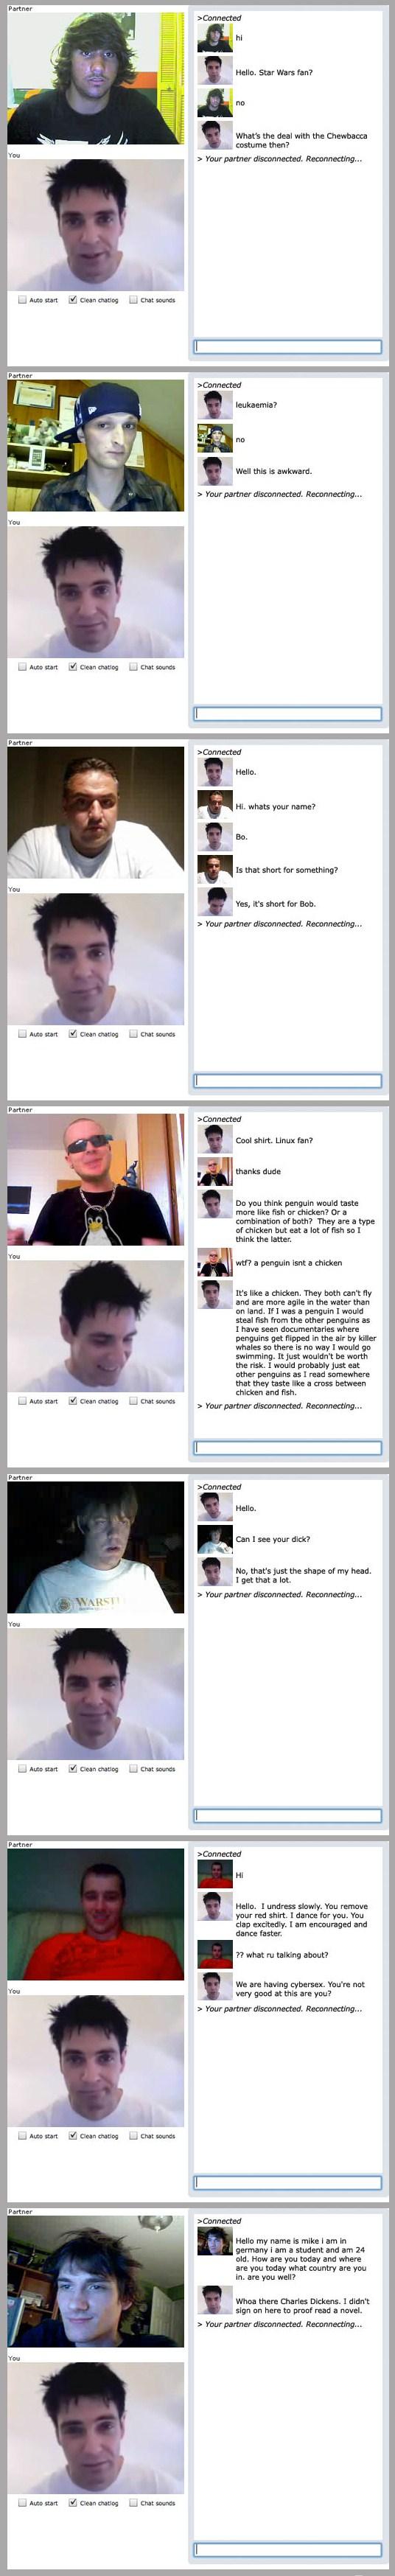 jerkin chat